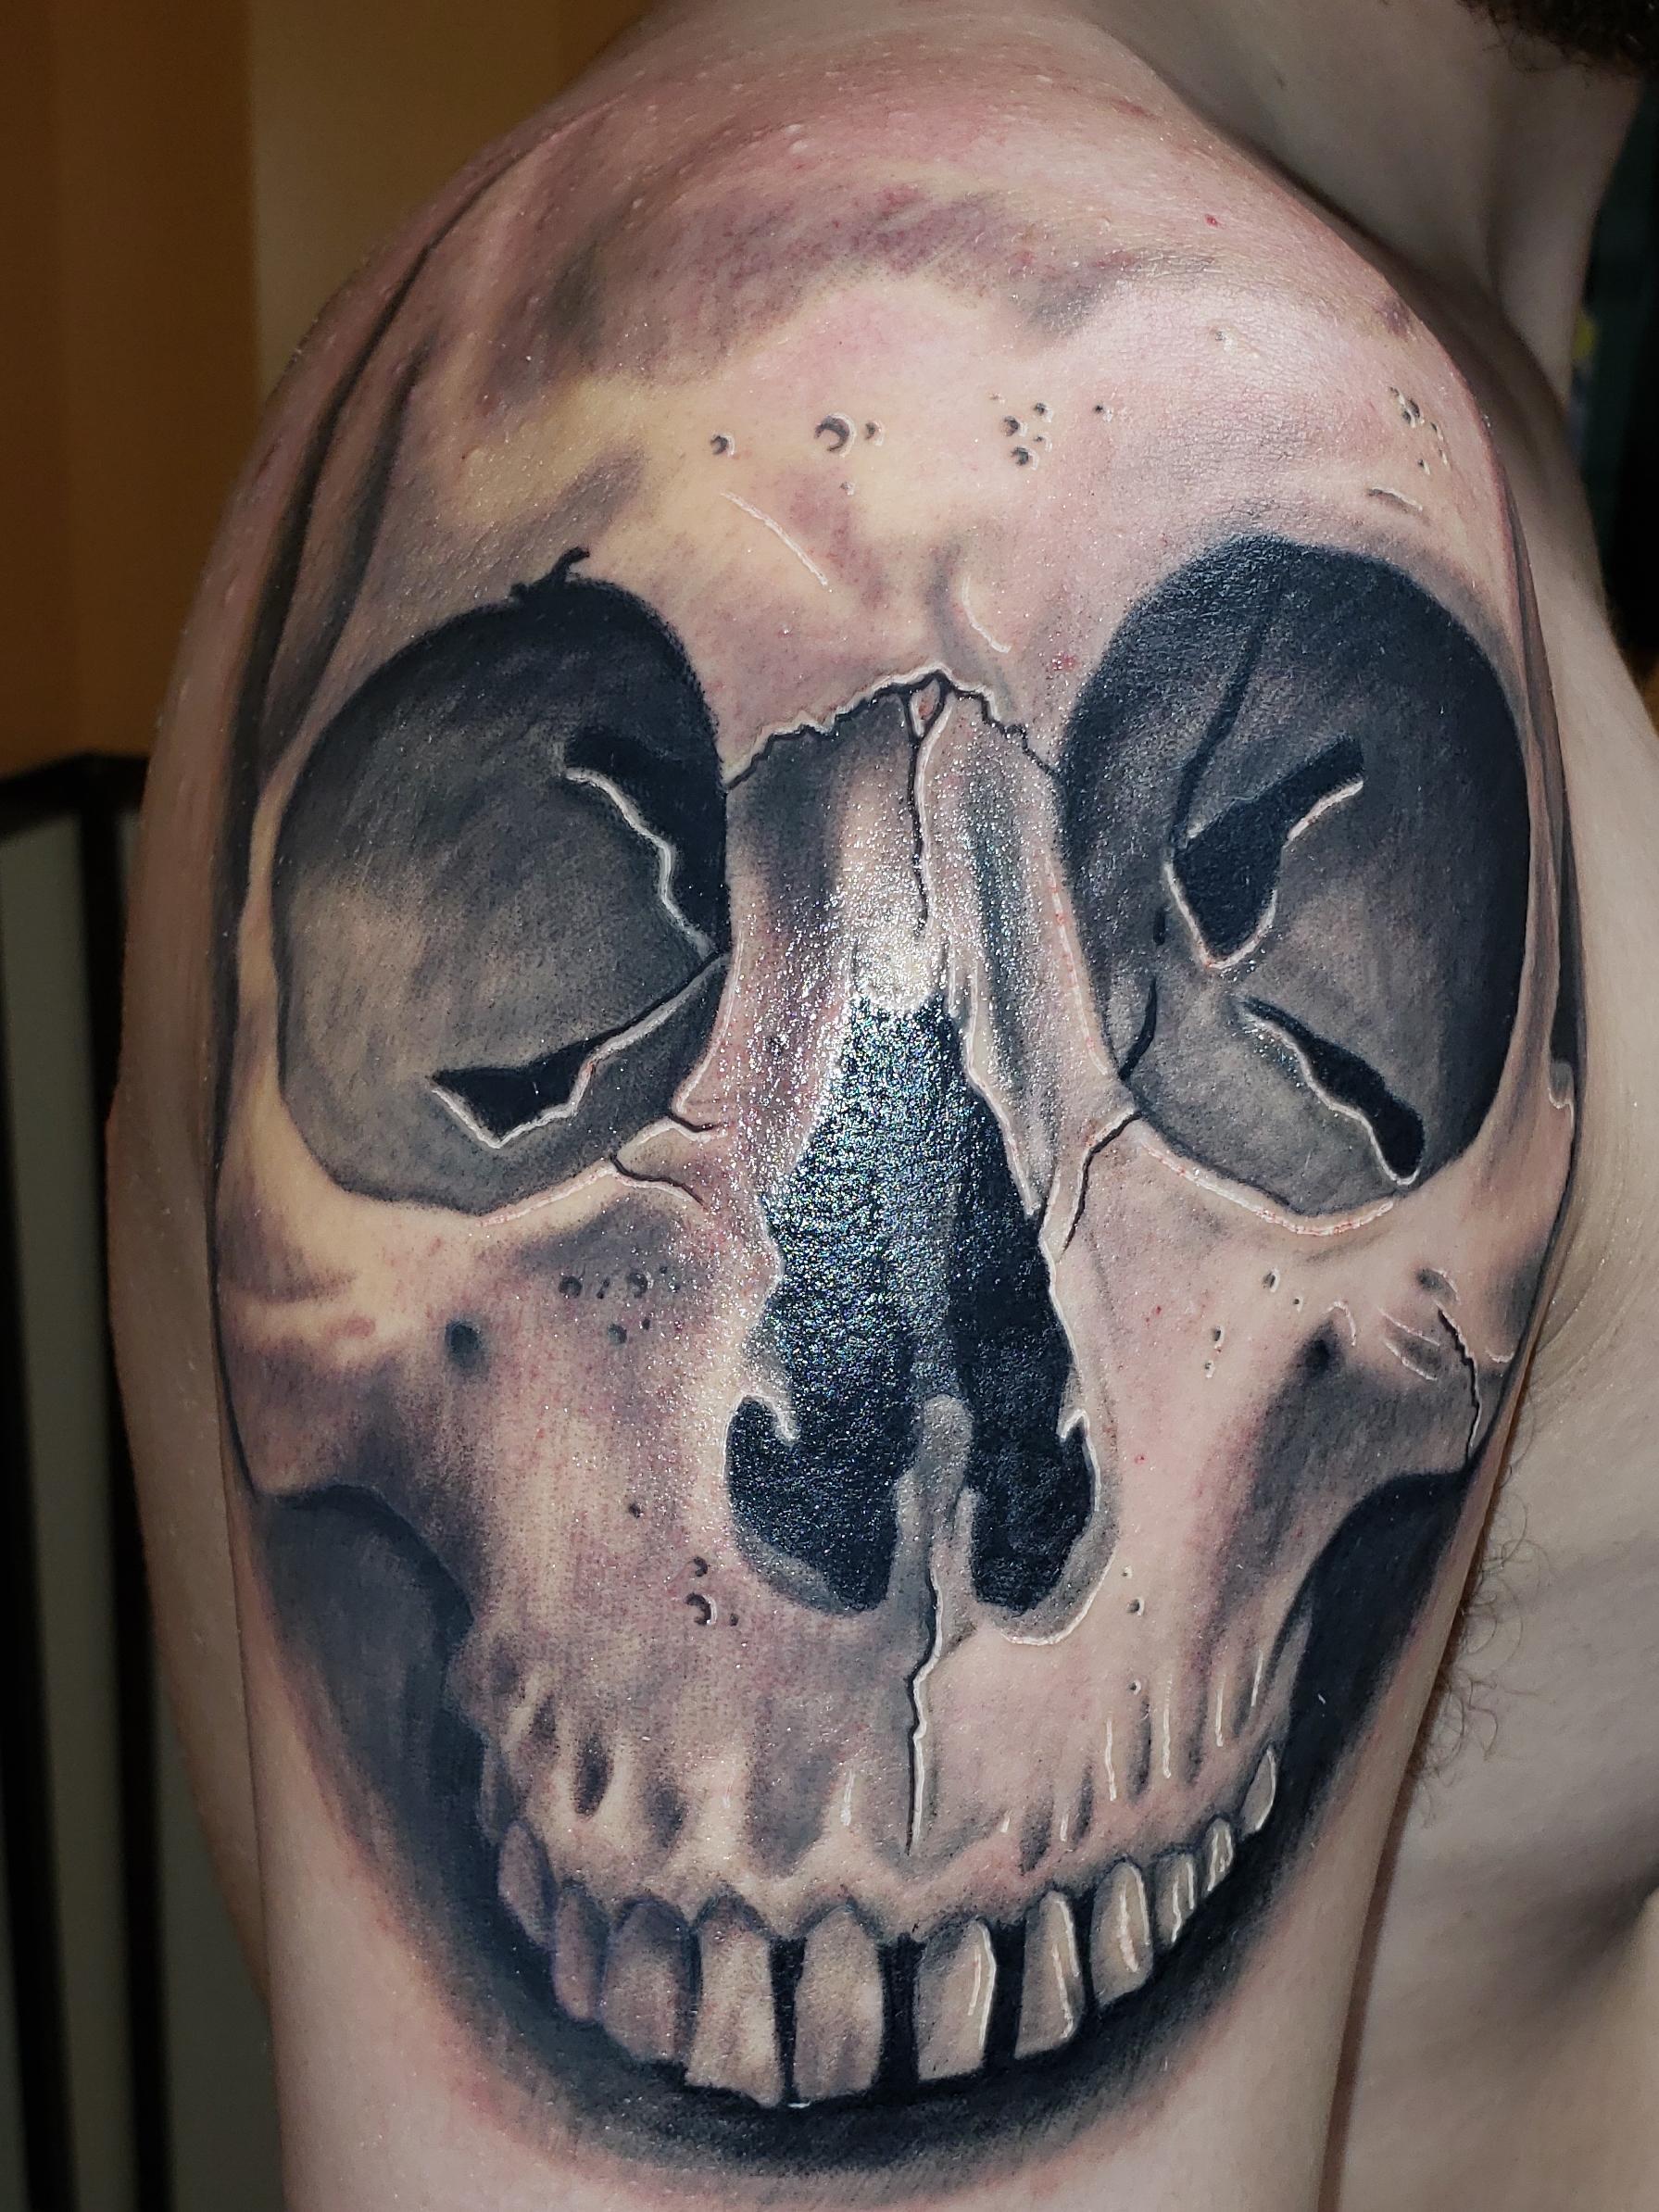 Evolved Tattoo : evolved, tattoo, First, Tattoo, Langley, Evolved, Columbus,, Tattoos